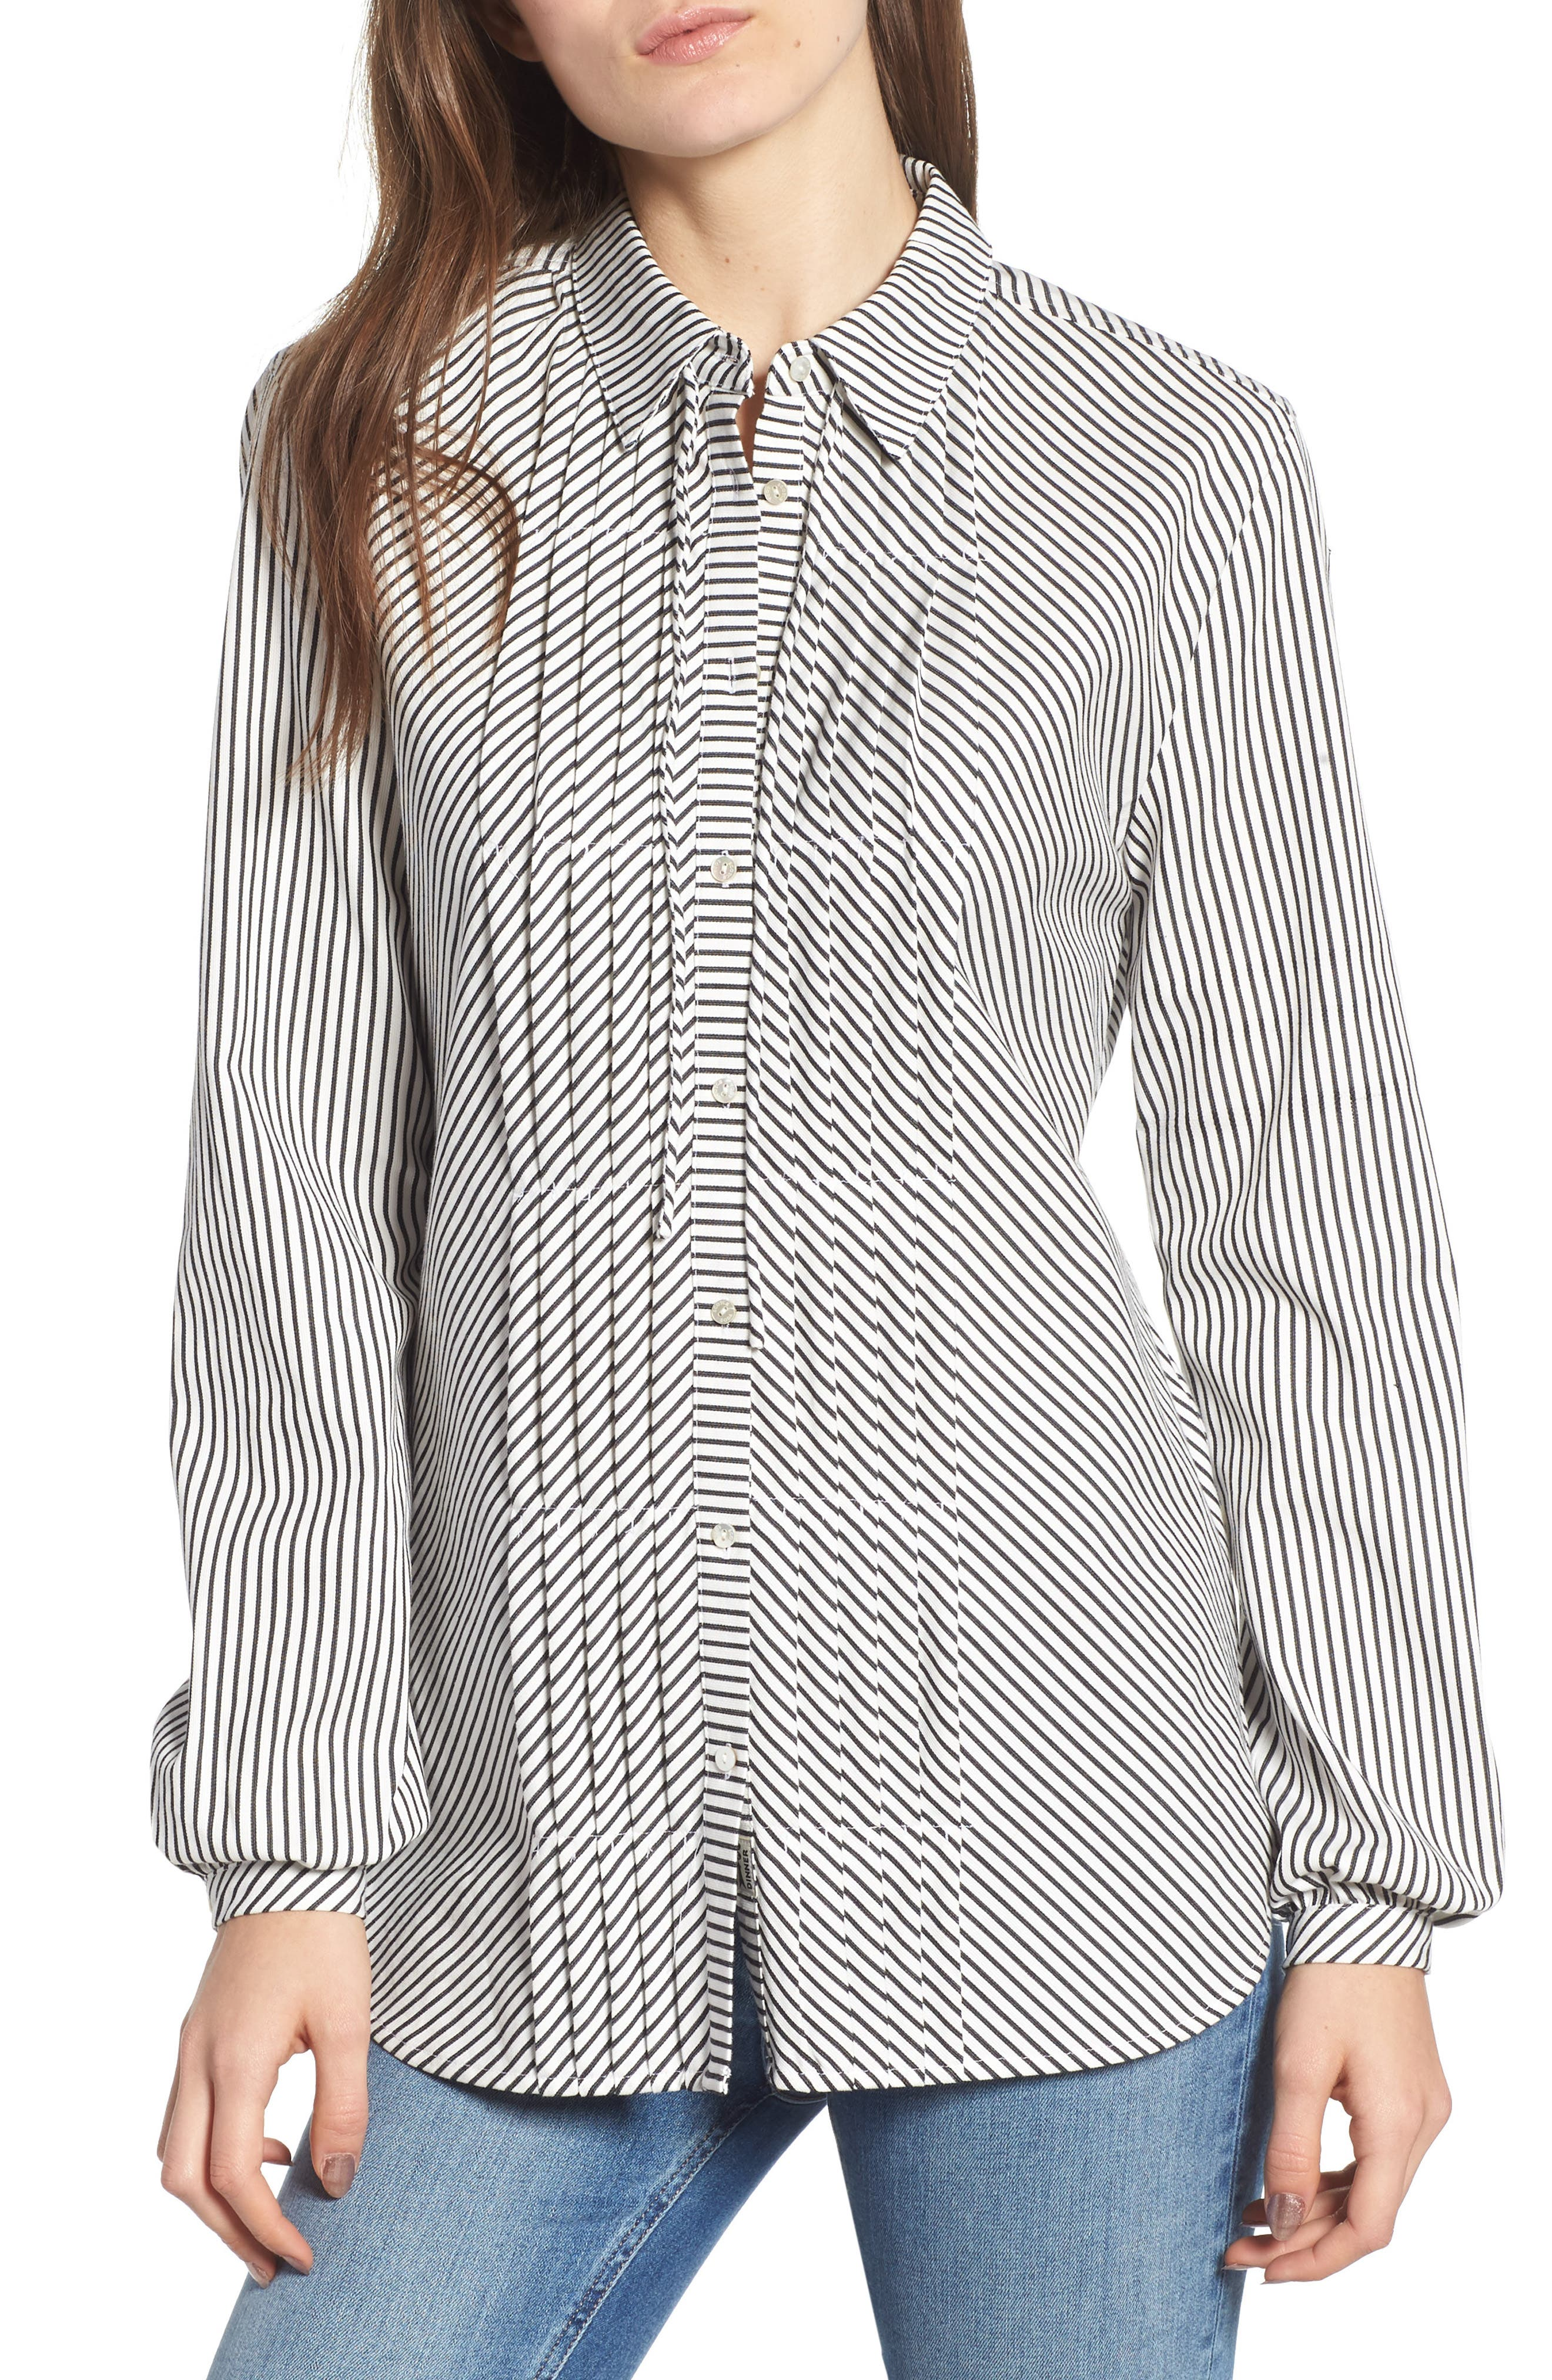 Stripe Pleat Shirt,                             Main thumbnail 1, color,                             BLACK/ WHITE PIN STRIPE